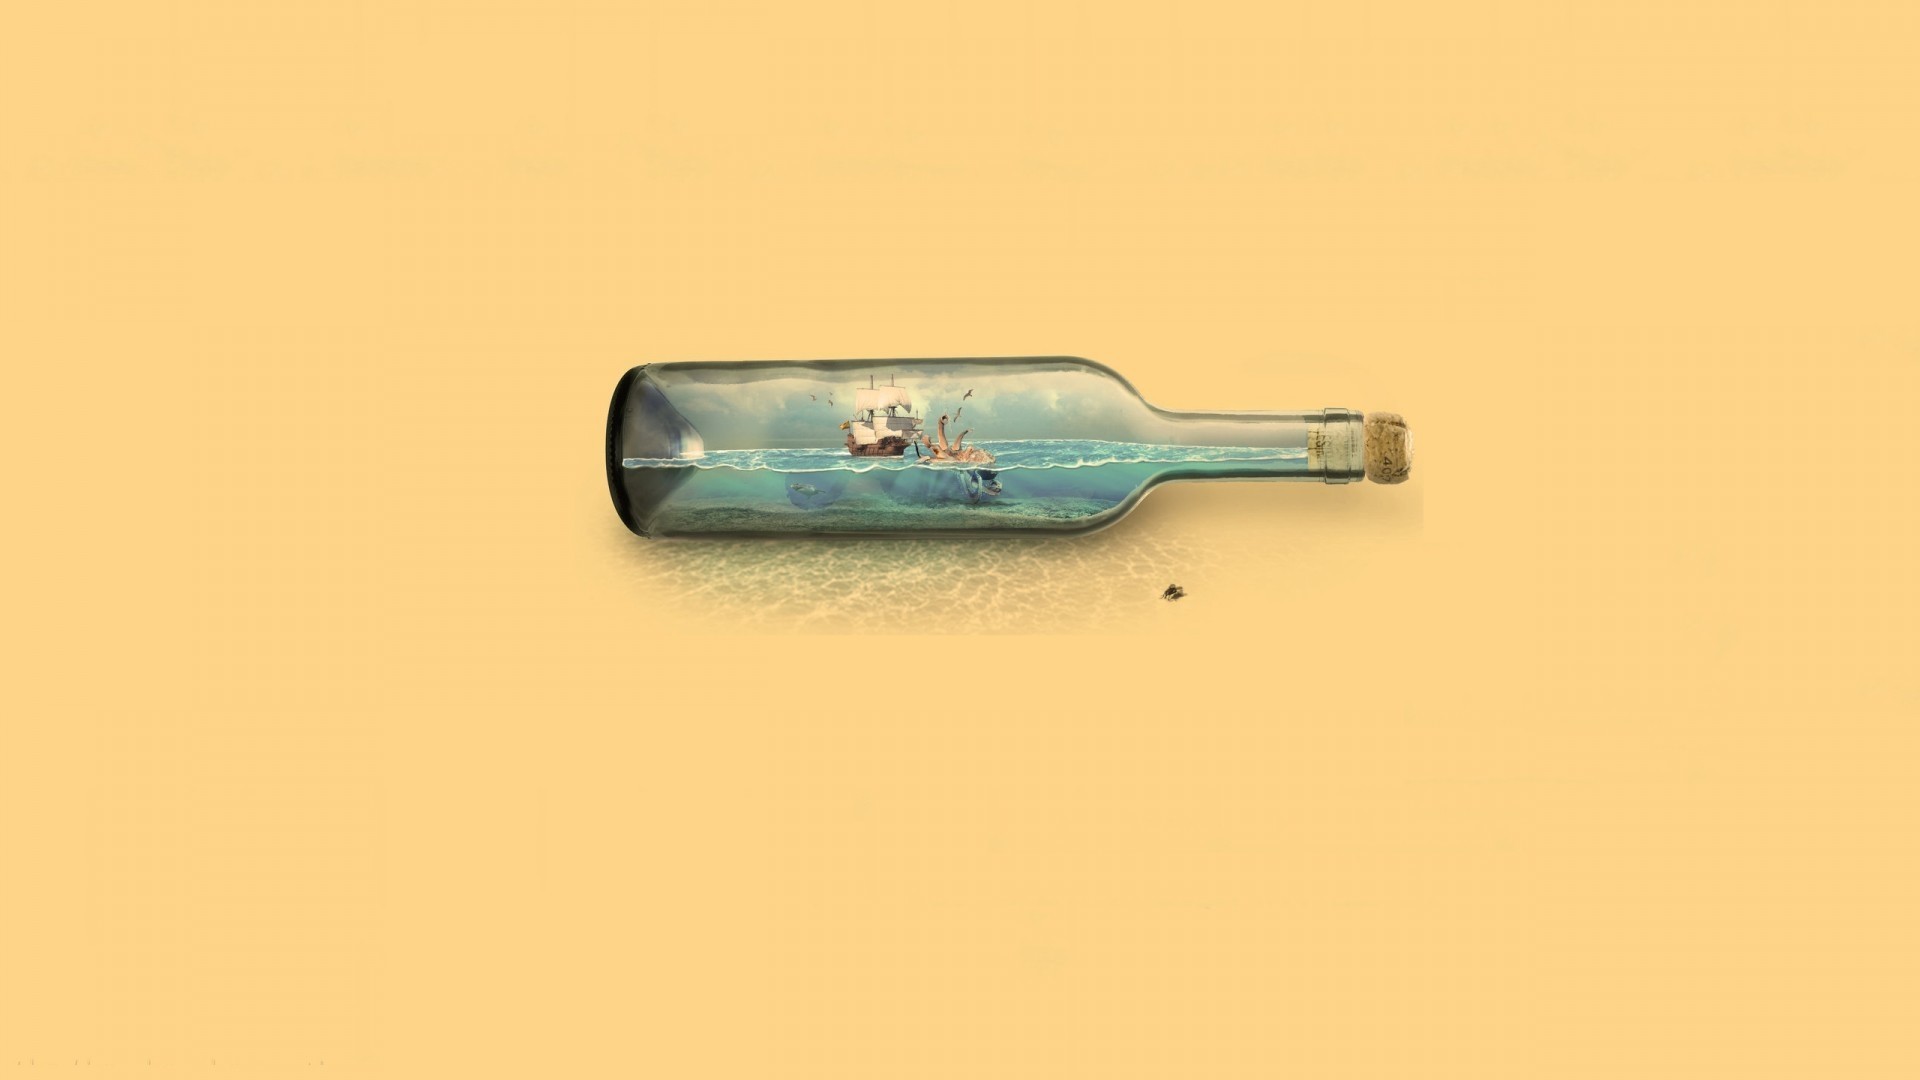 Ship In A Bottle Wallpaper theme